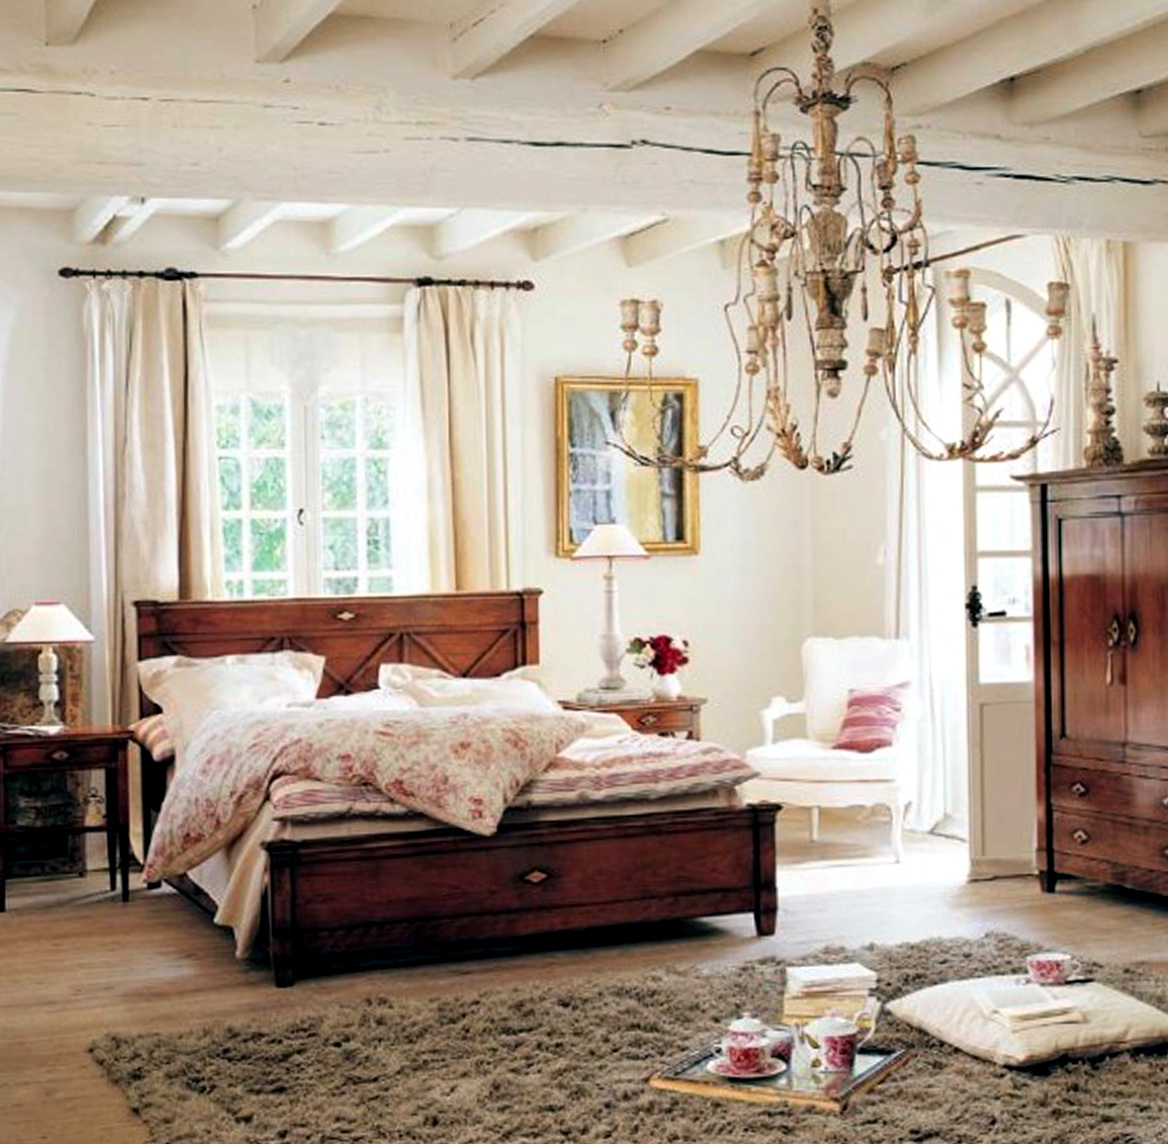 Paris Bedroom Decor Australia